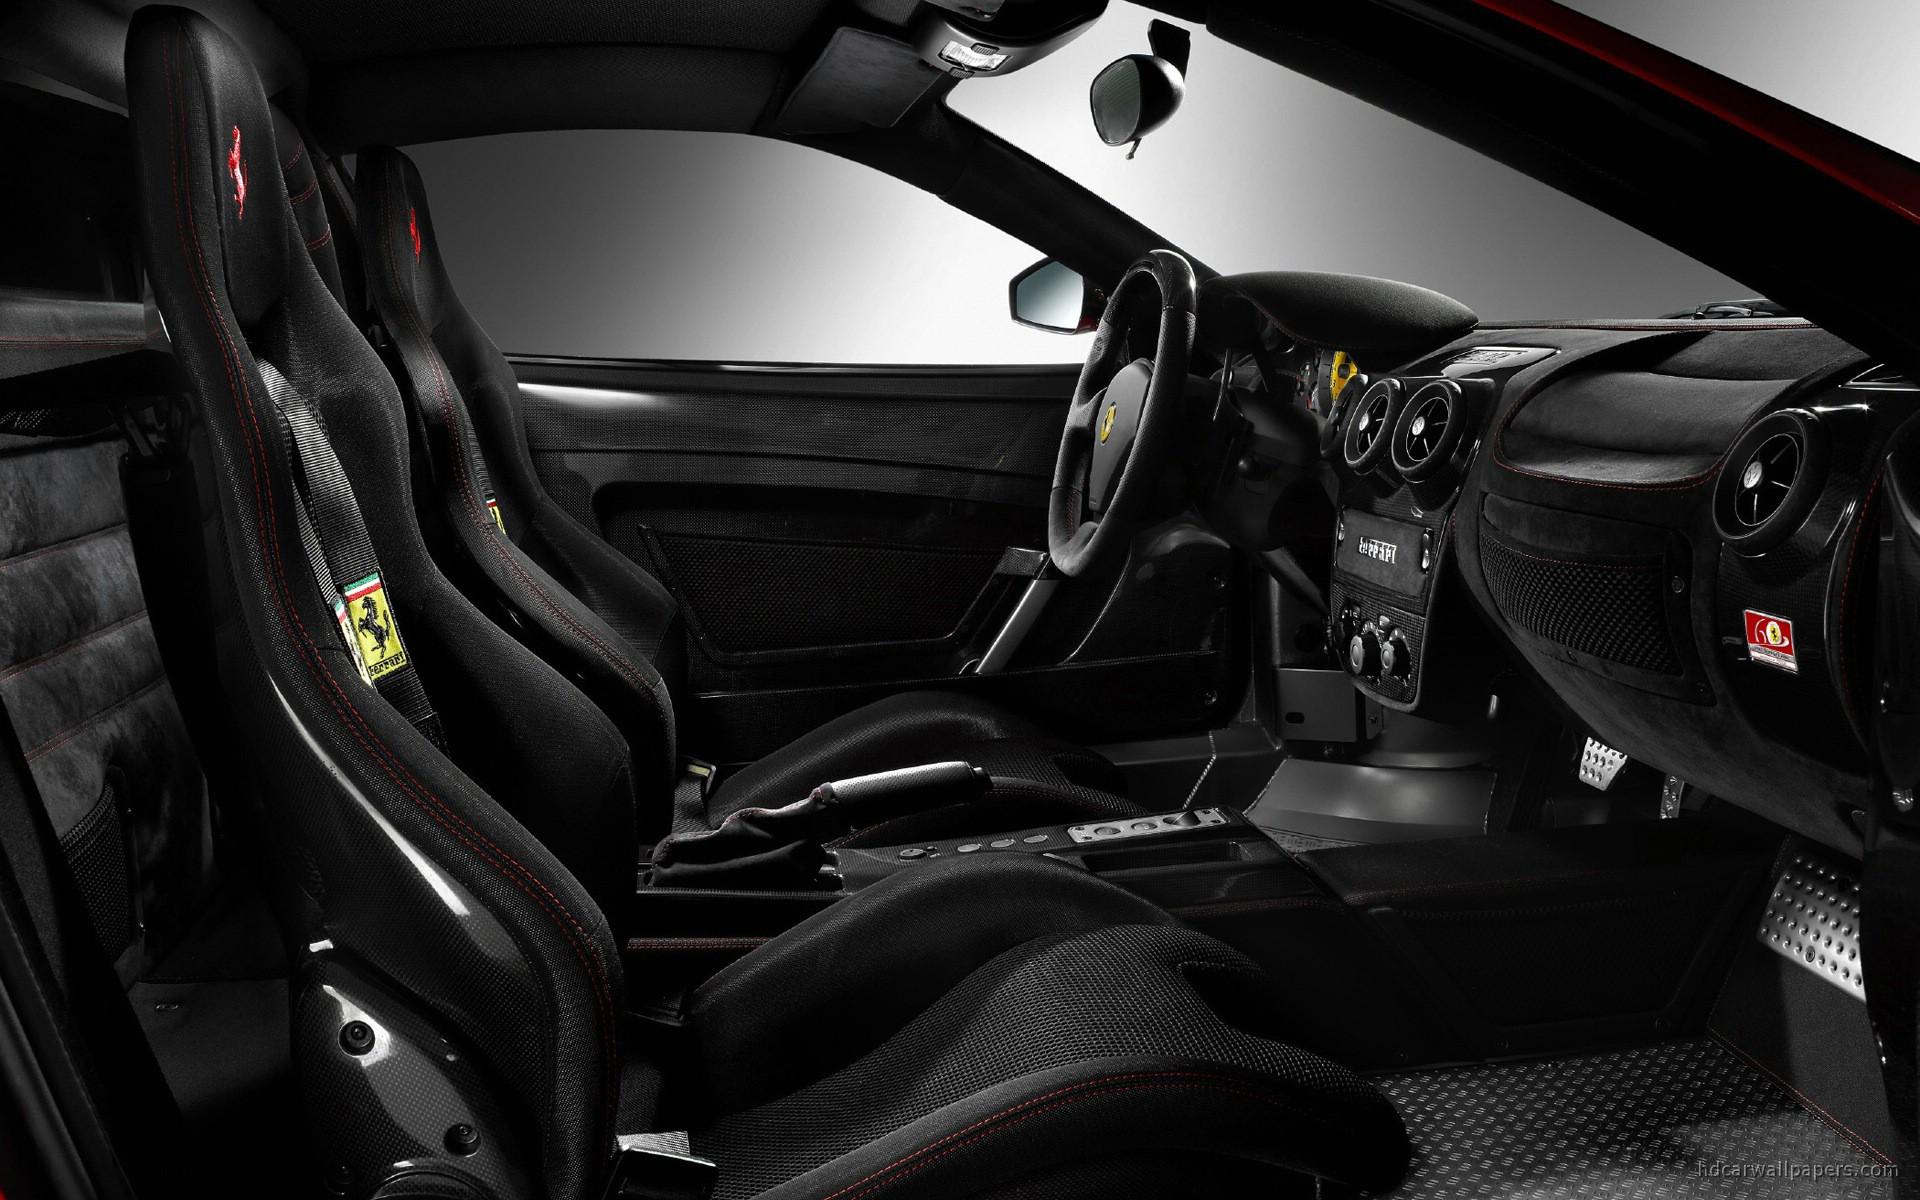 Ferrari f430 scuderia wallpaper 70 wallpapers hd wallpapers vanachro Image collections